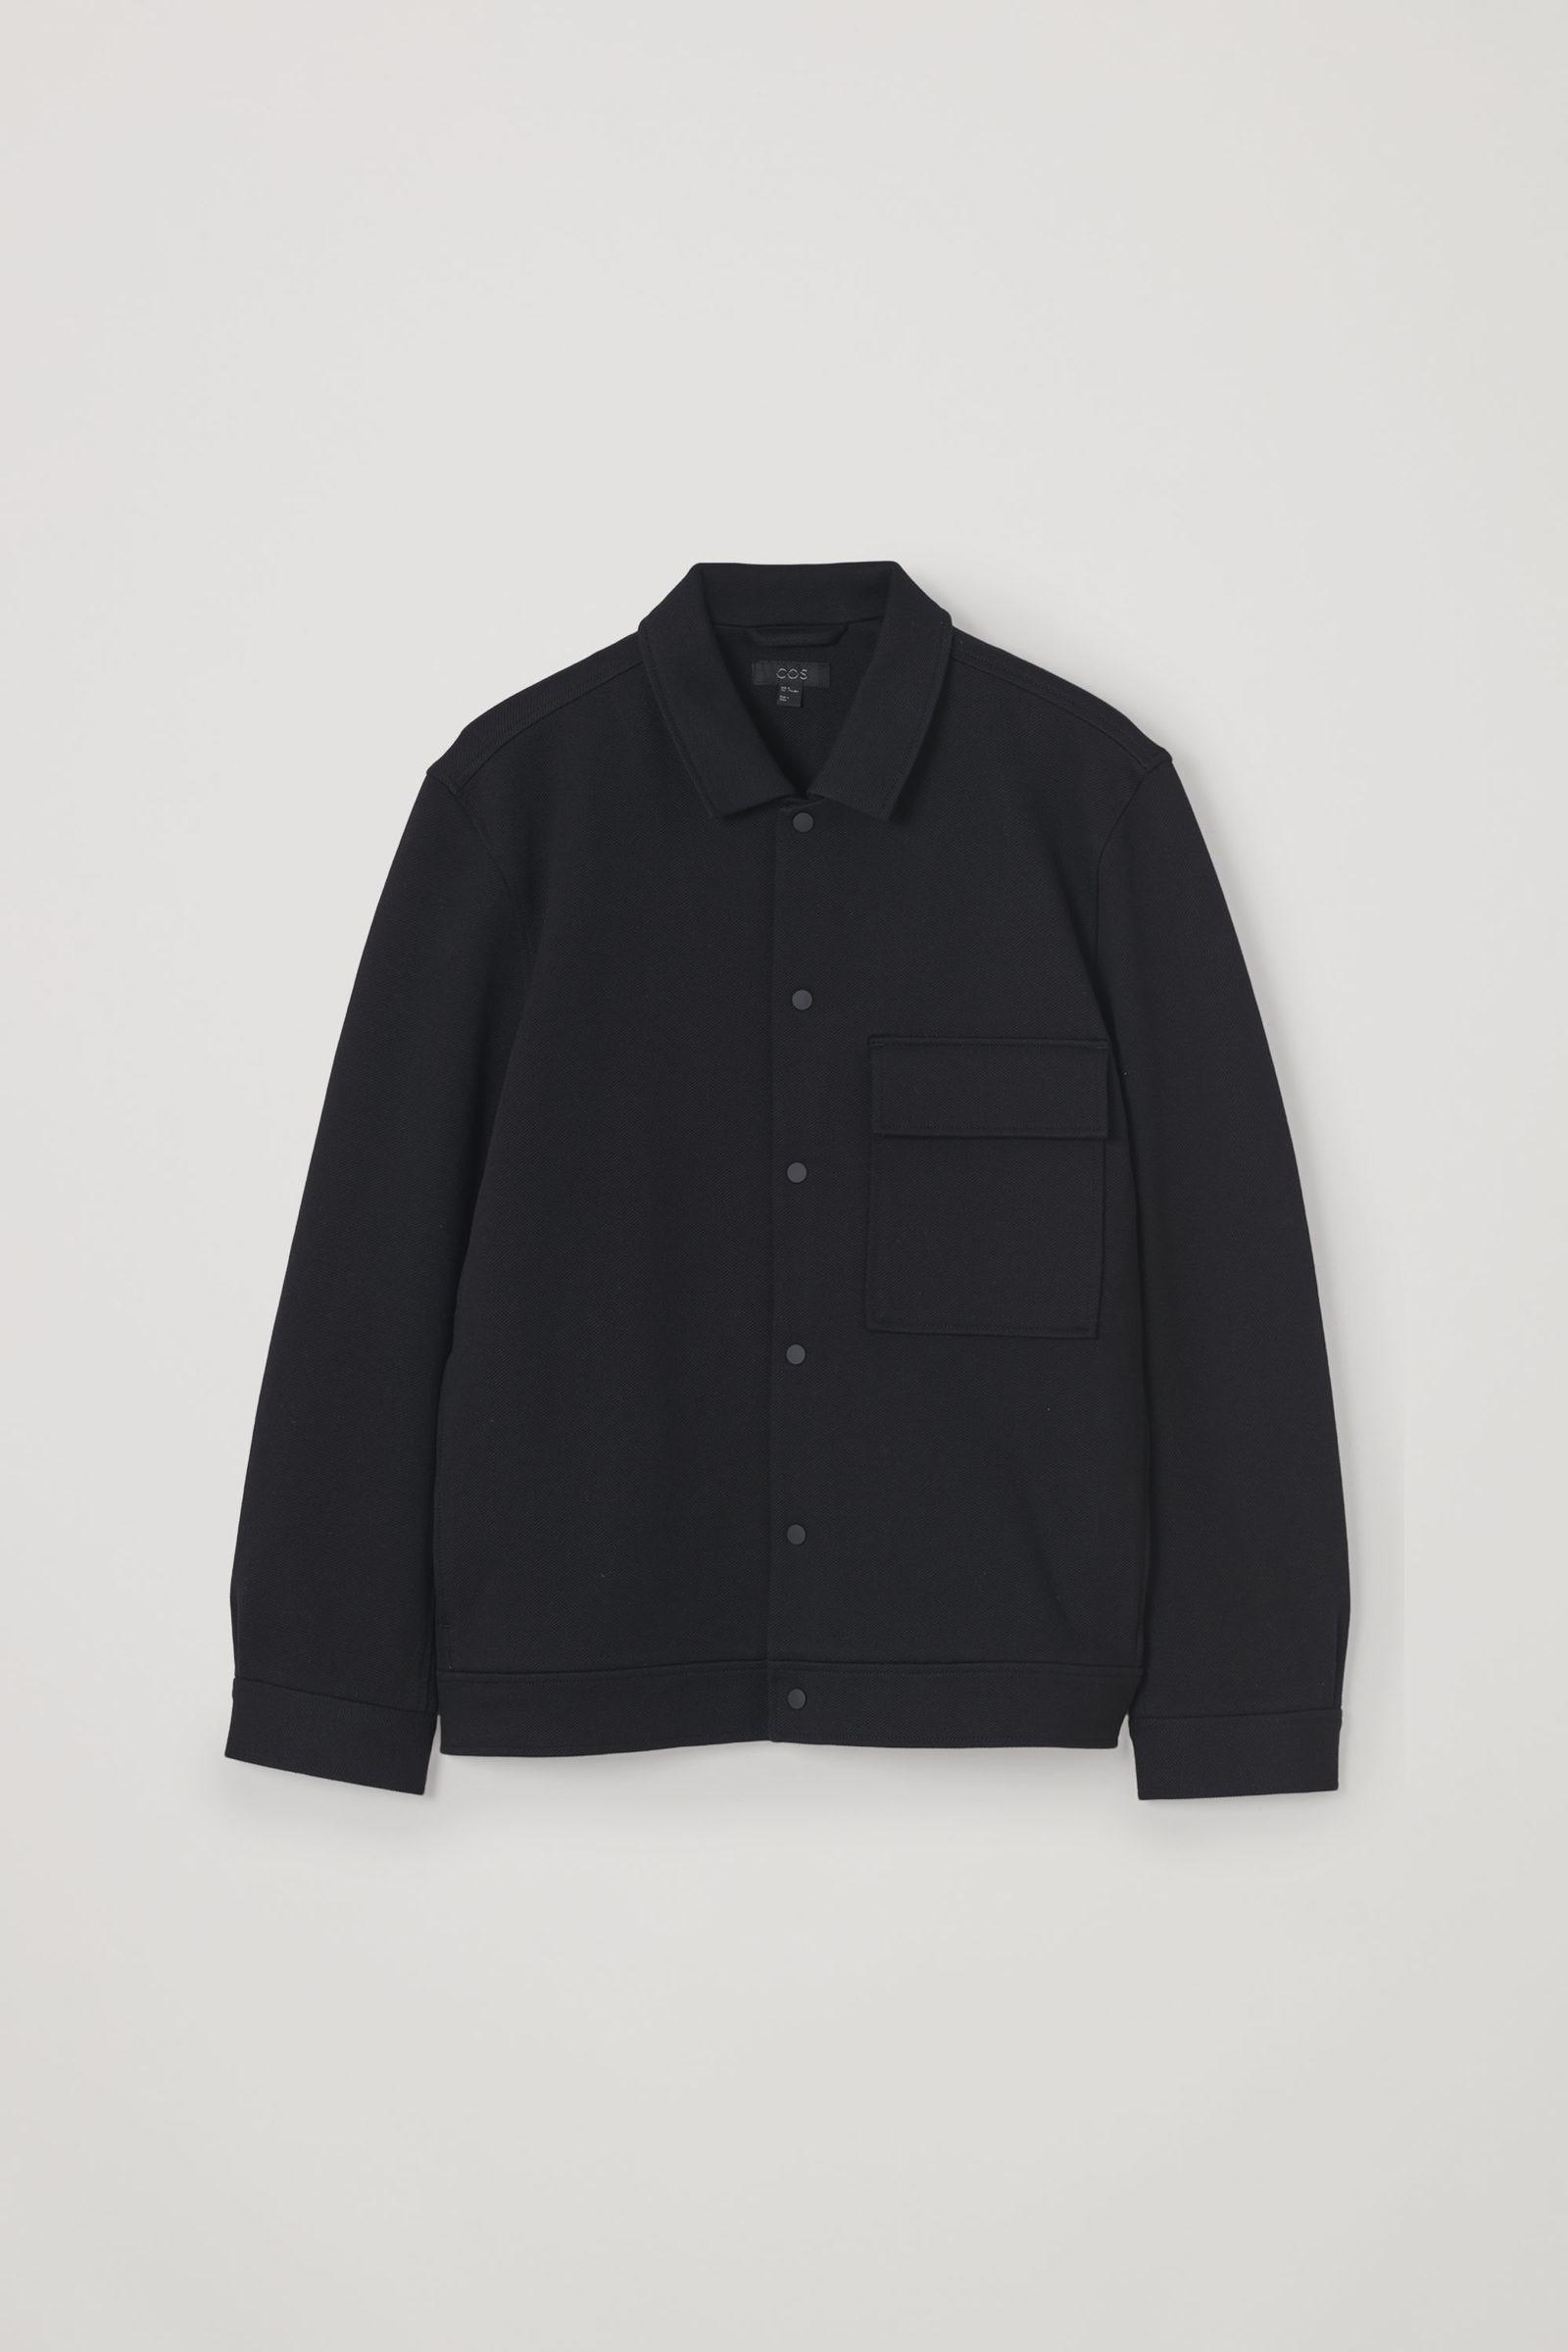 COS 코튼 트윌 셔츠 재킷의 블랙컬러 Product입니다.